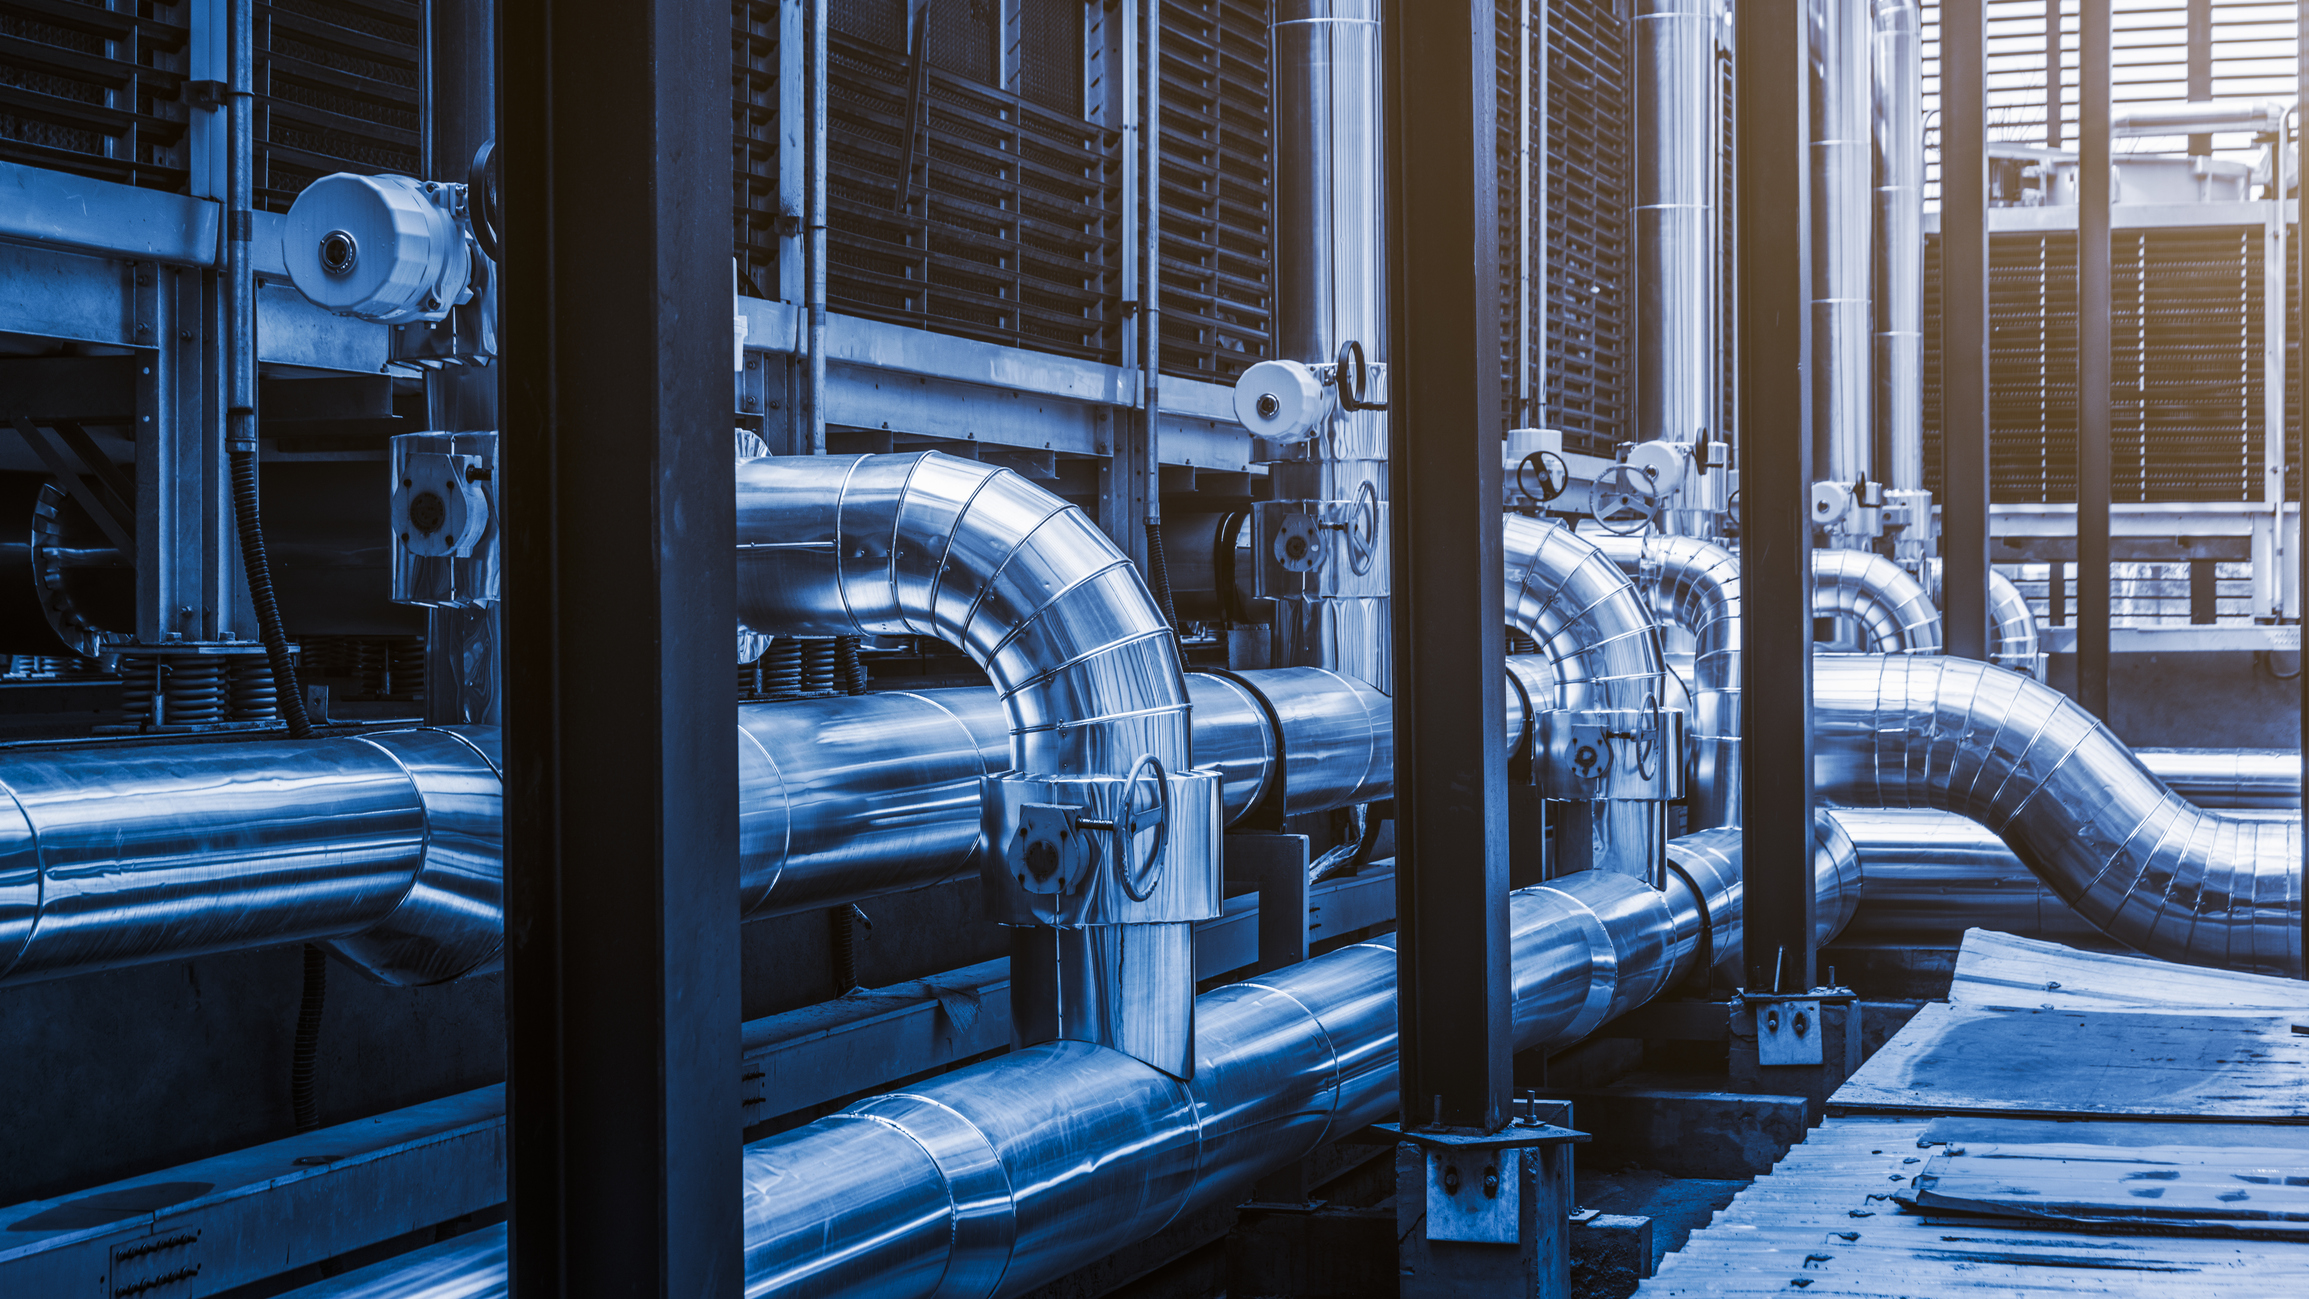 SteelHorse Heating & Air LTD